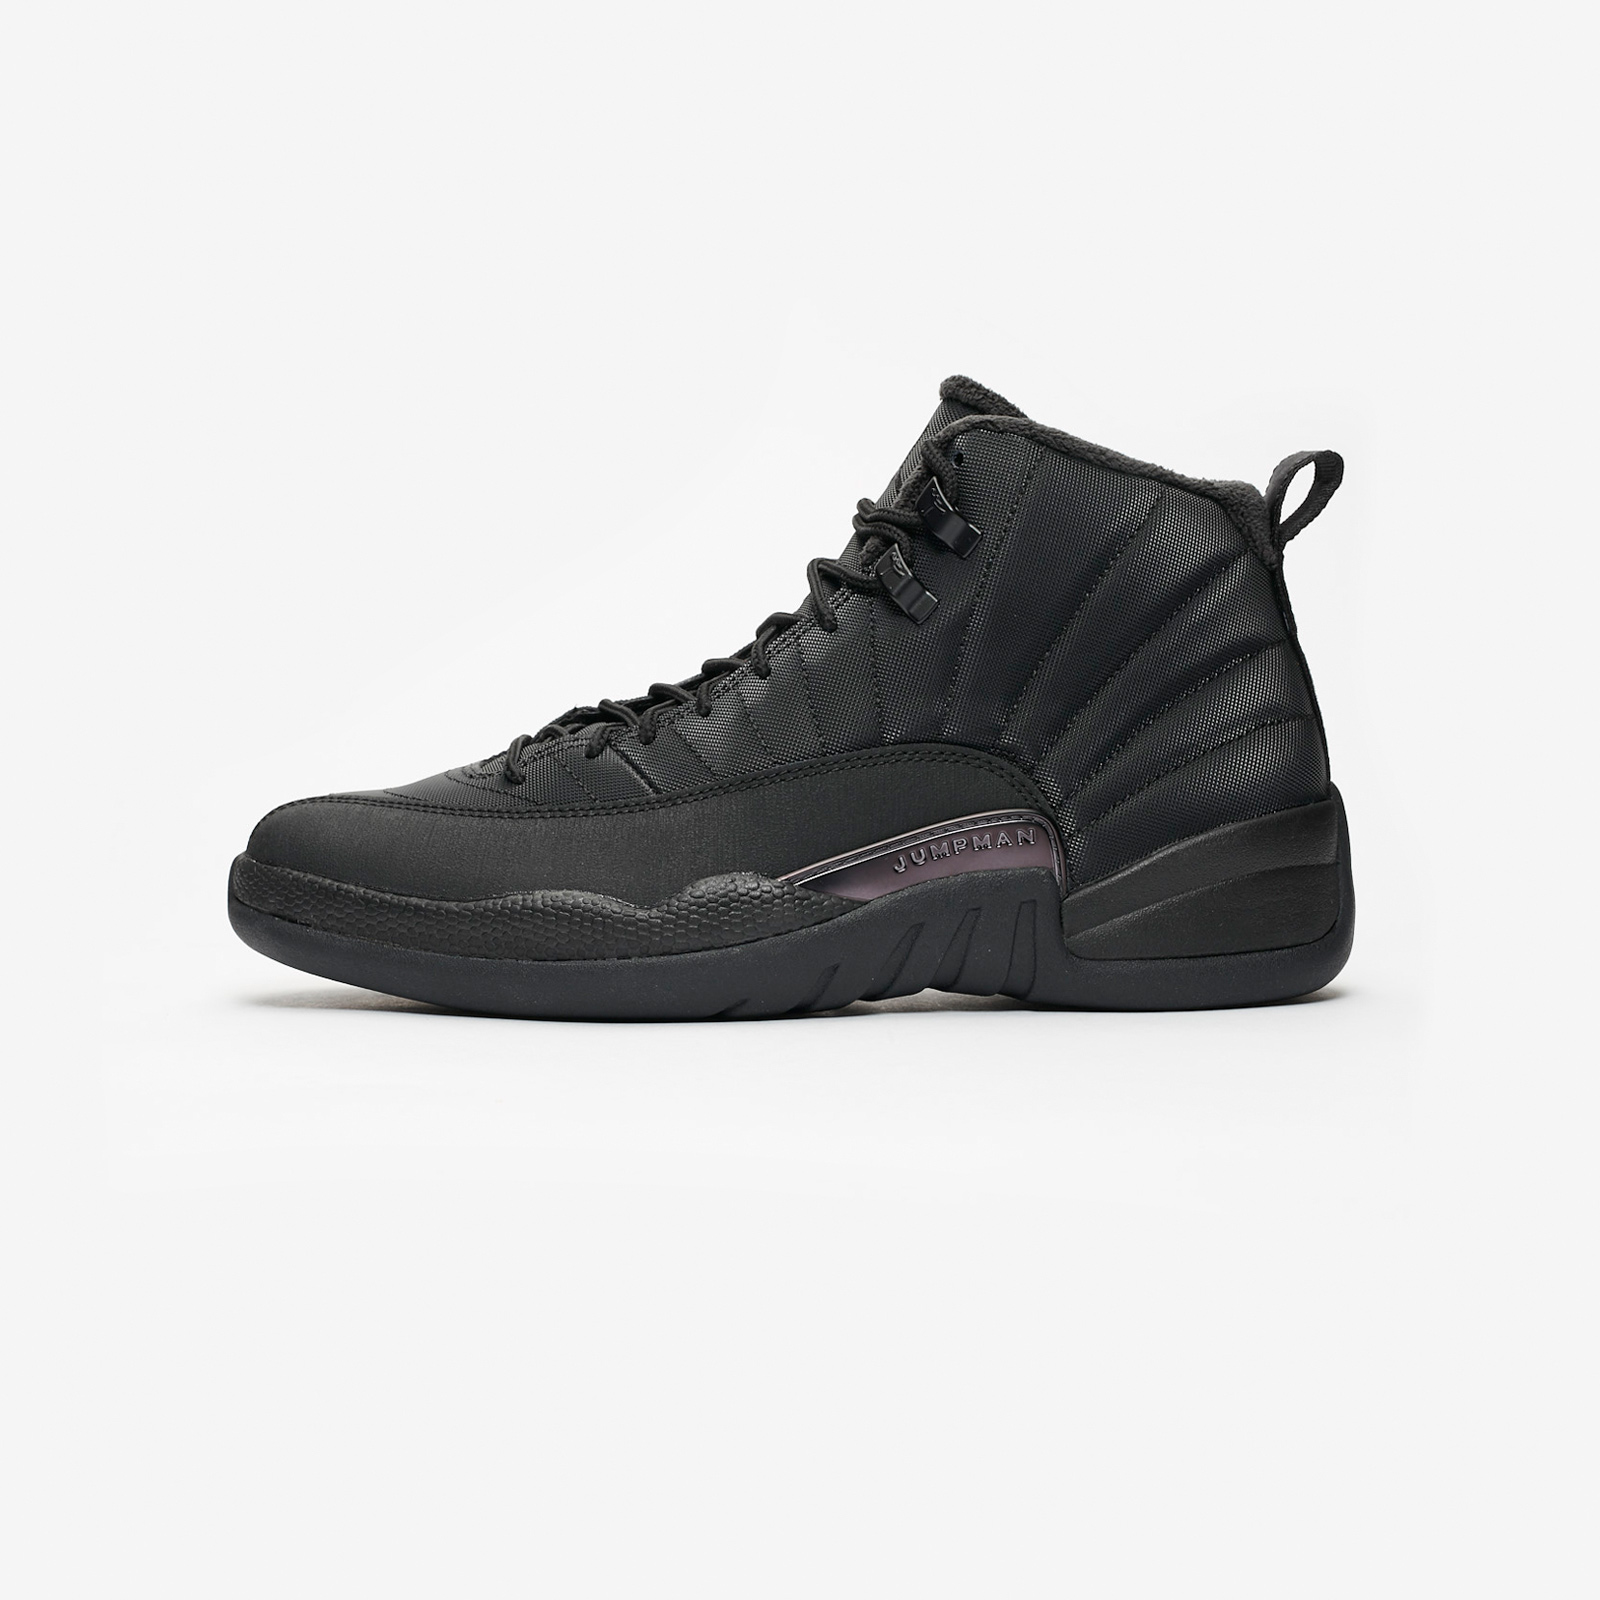 3870d14a731e77 Jordan Brand Air Jordan 12 Retro Winter - Bq6851-001 - Sneakersnstuff